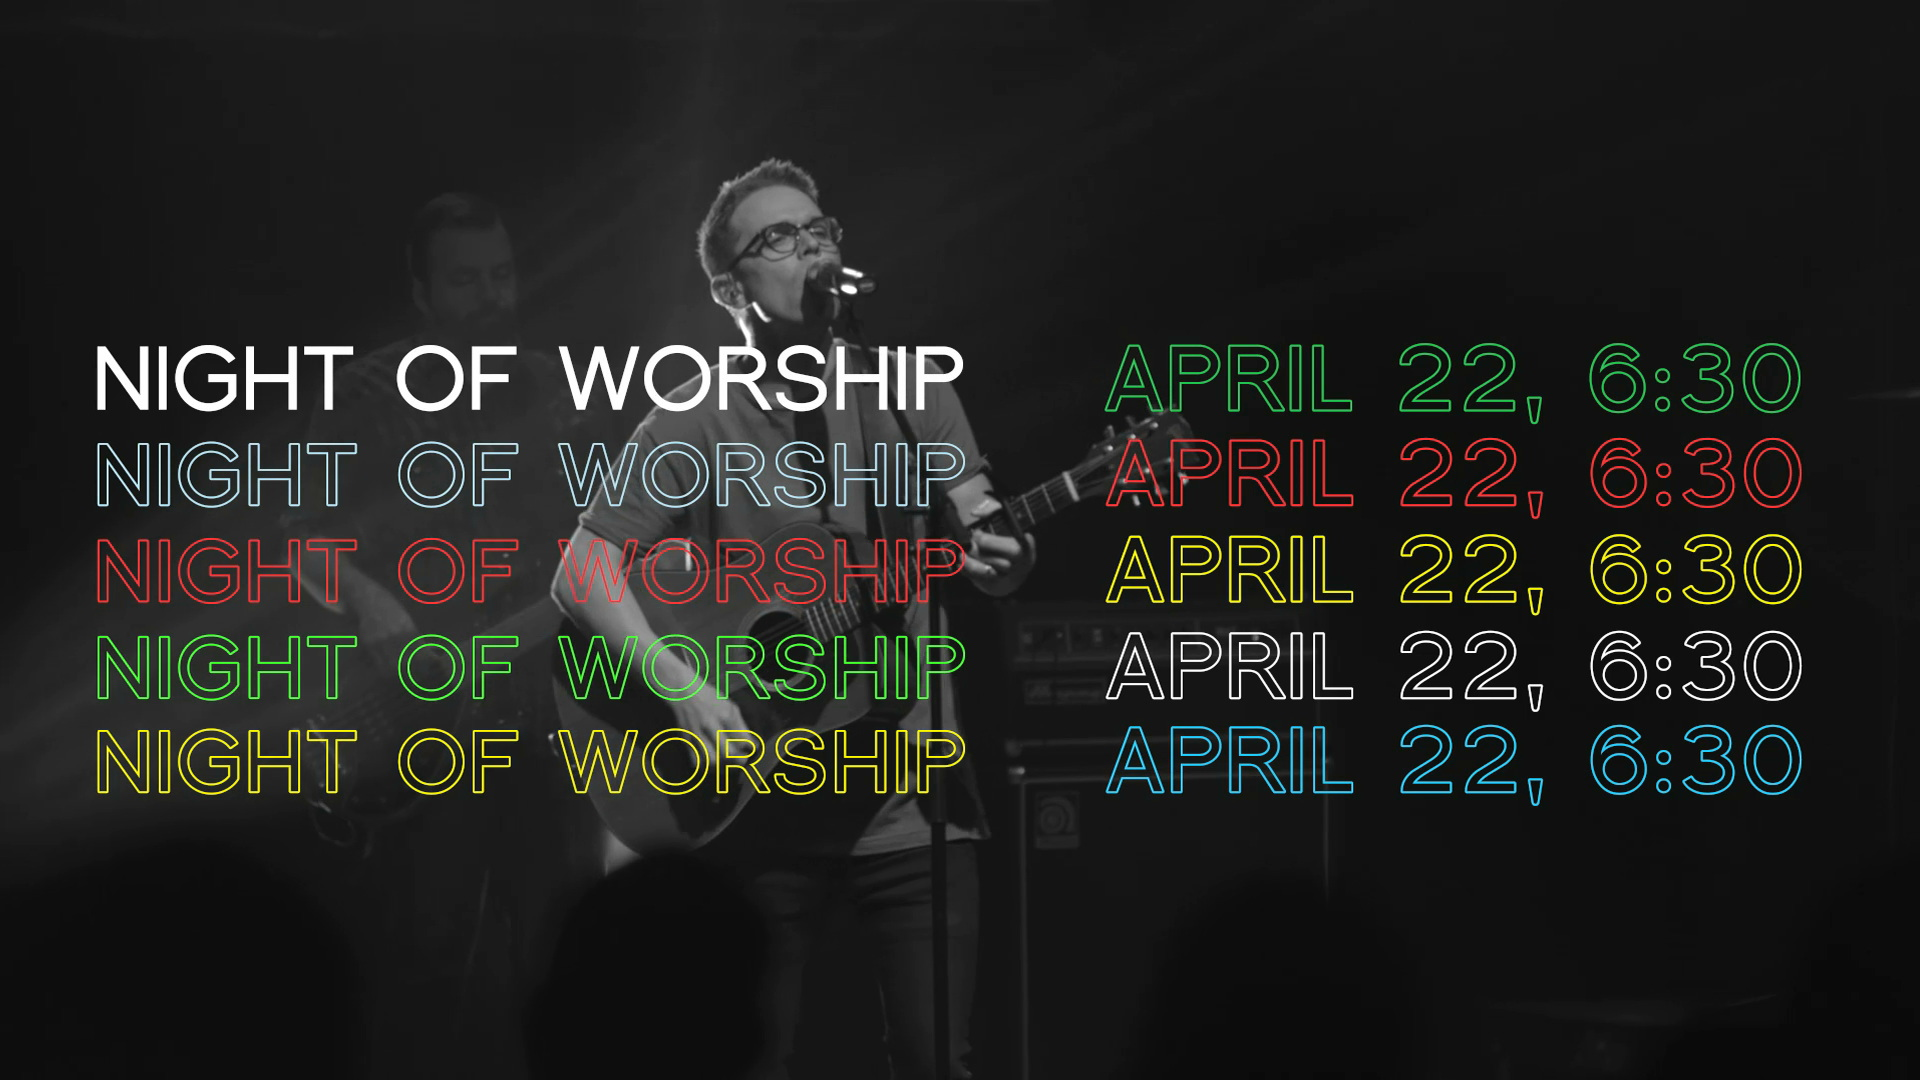 Night of worship promo